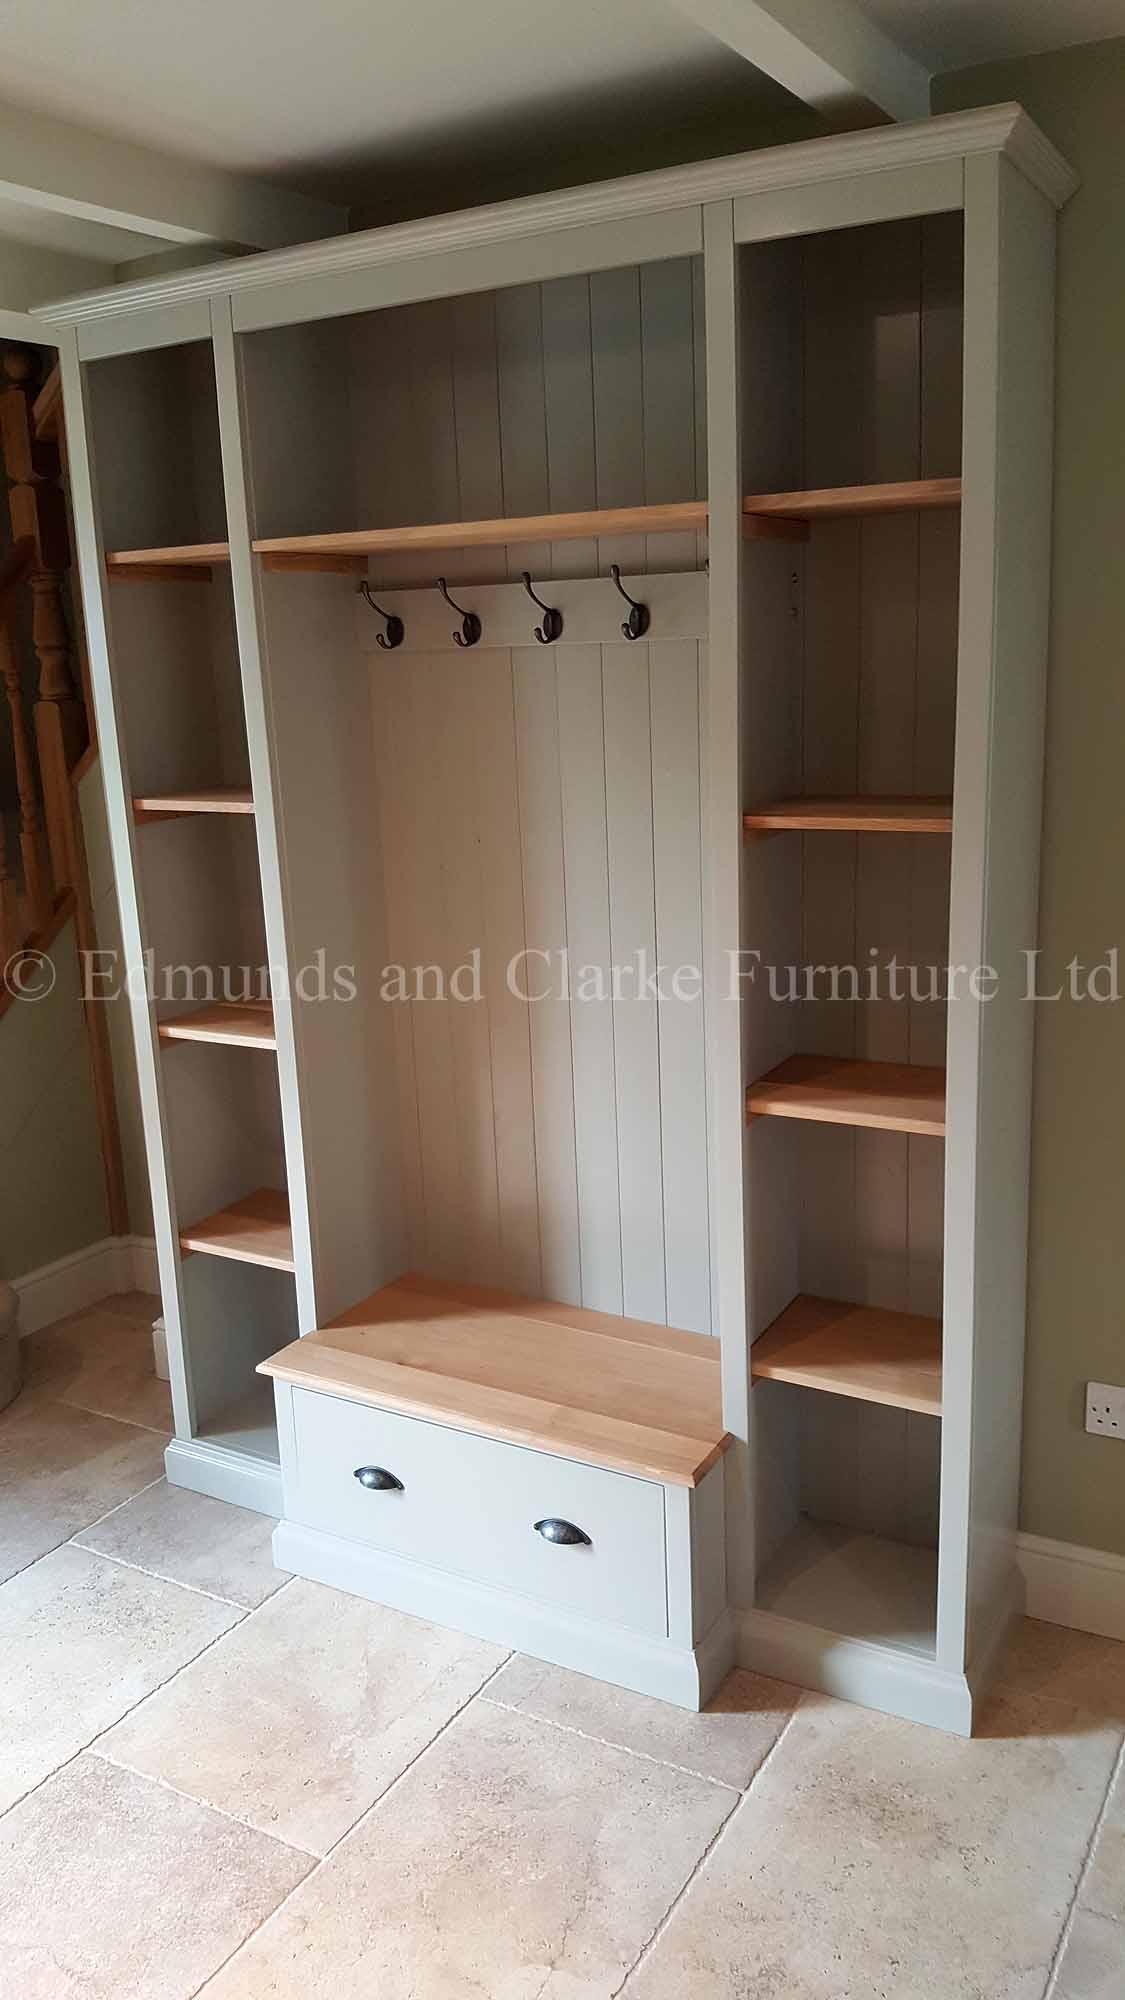 Foyer Storage Xbox One : Bespoke hallway storage unit edmunds clarke furniture ltd